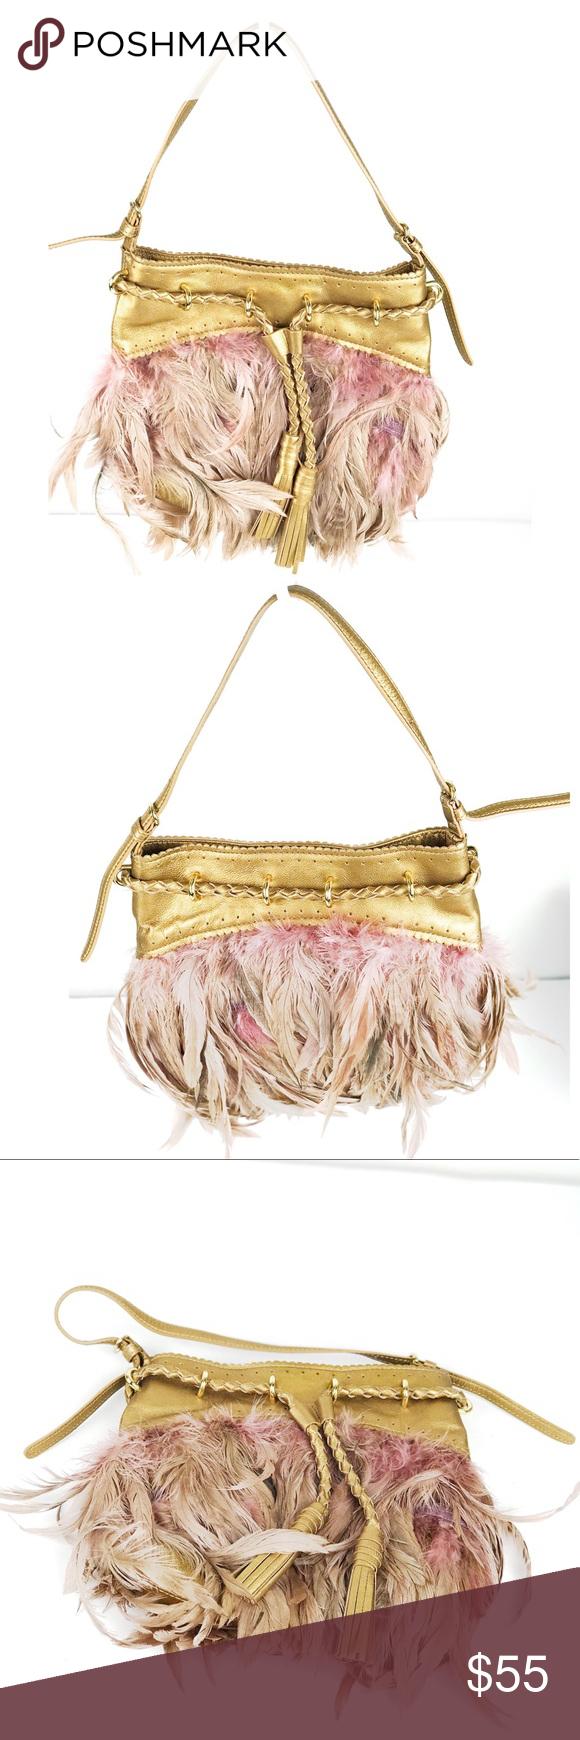 DKNY Metallic Gold Feathered Adjustable Purse DKNY Metallic Gold Feathered Adjus…